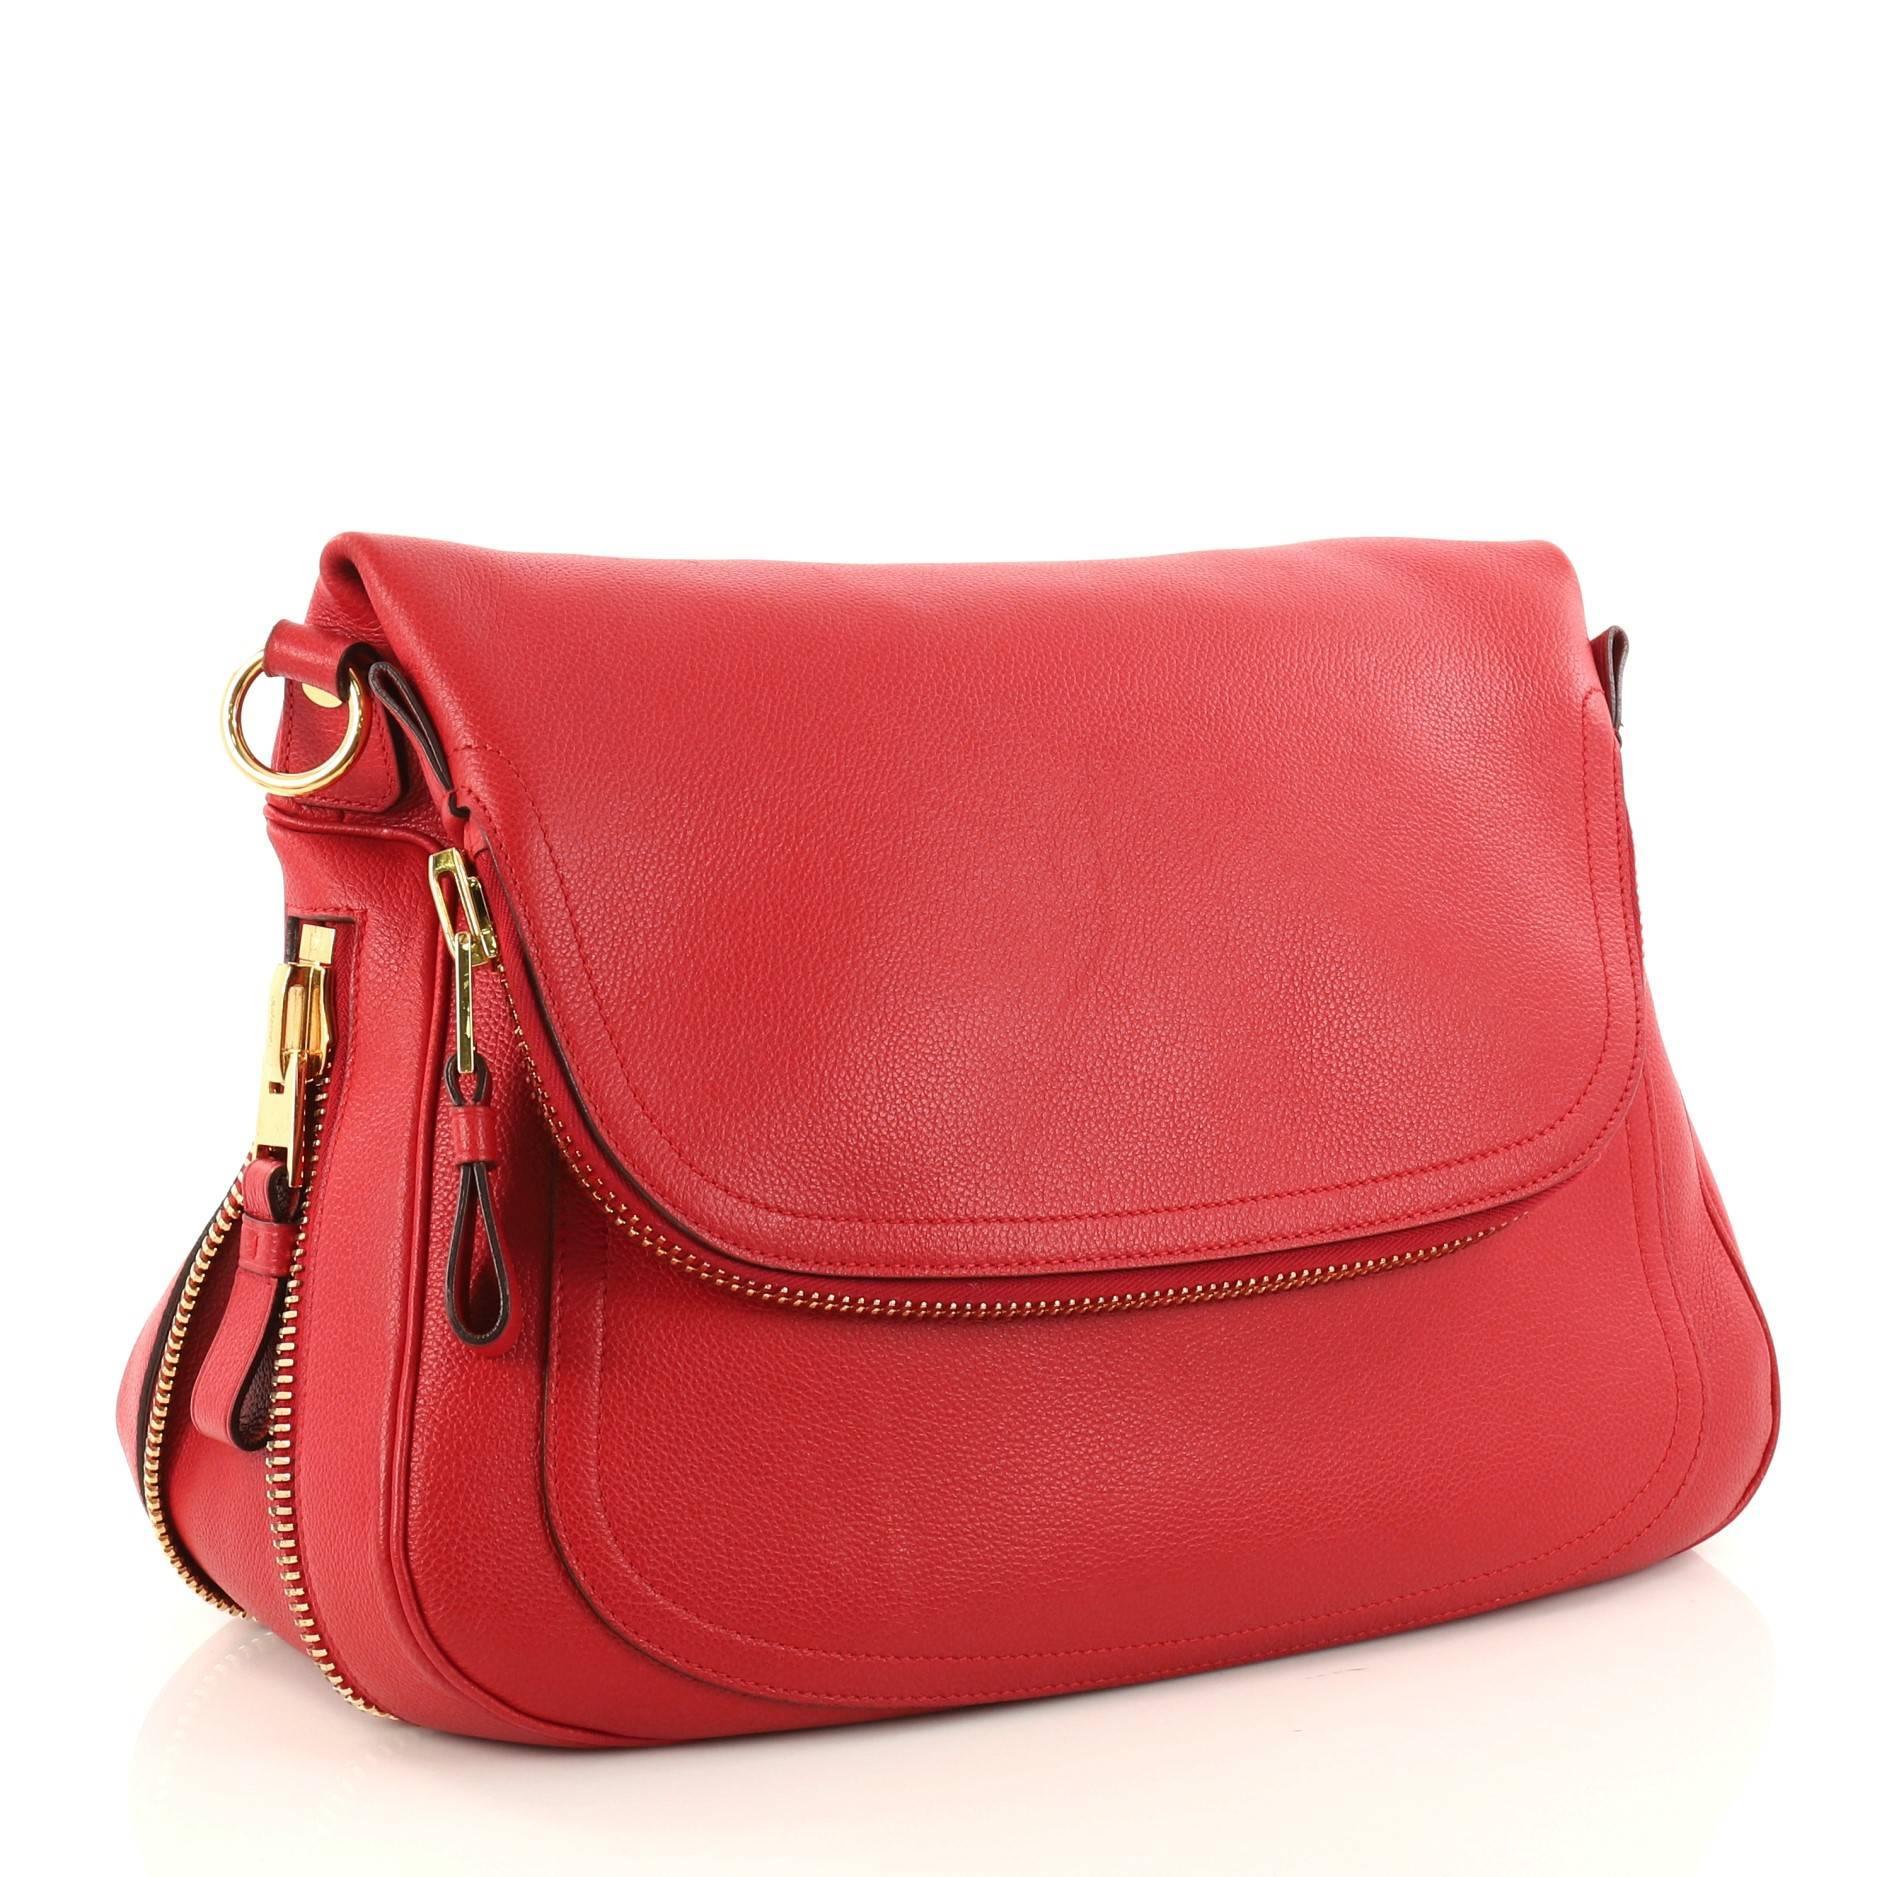 eeeb0a559bad5a Tom Ford Jennifer Shoulder Bag Leather Medium at 1stdibs